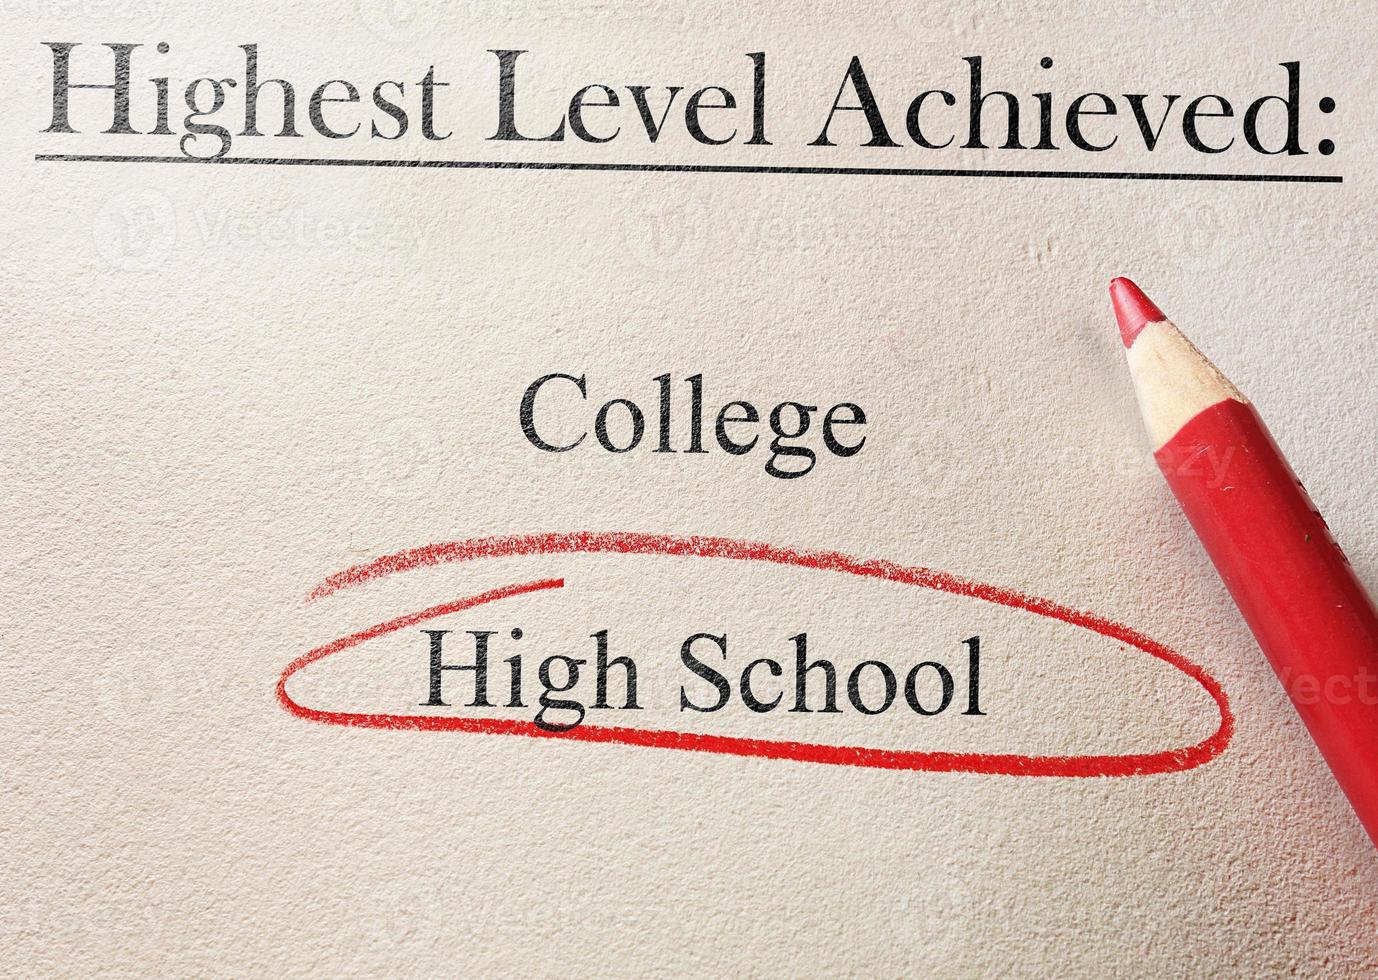 High School red circle photo